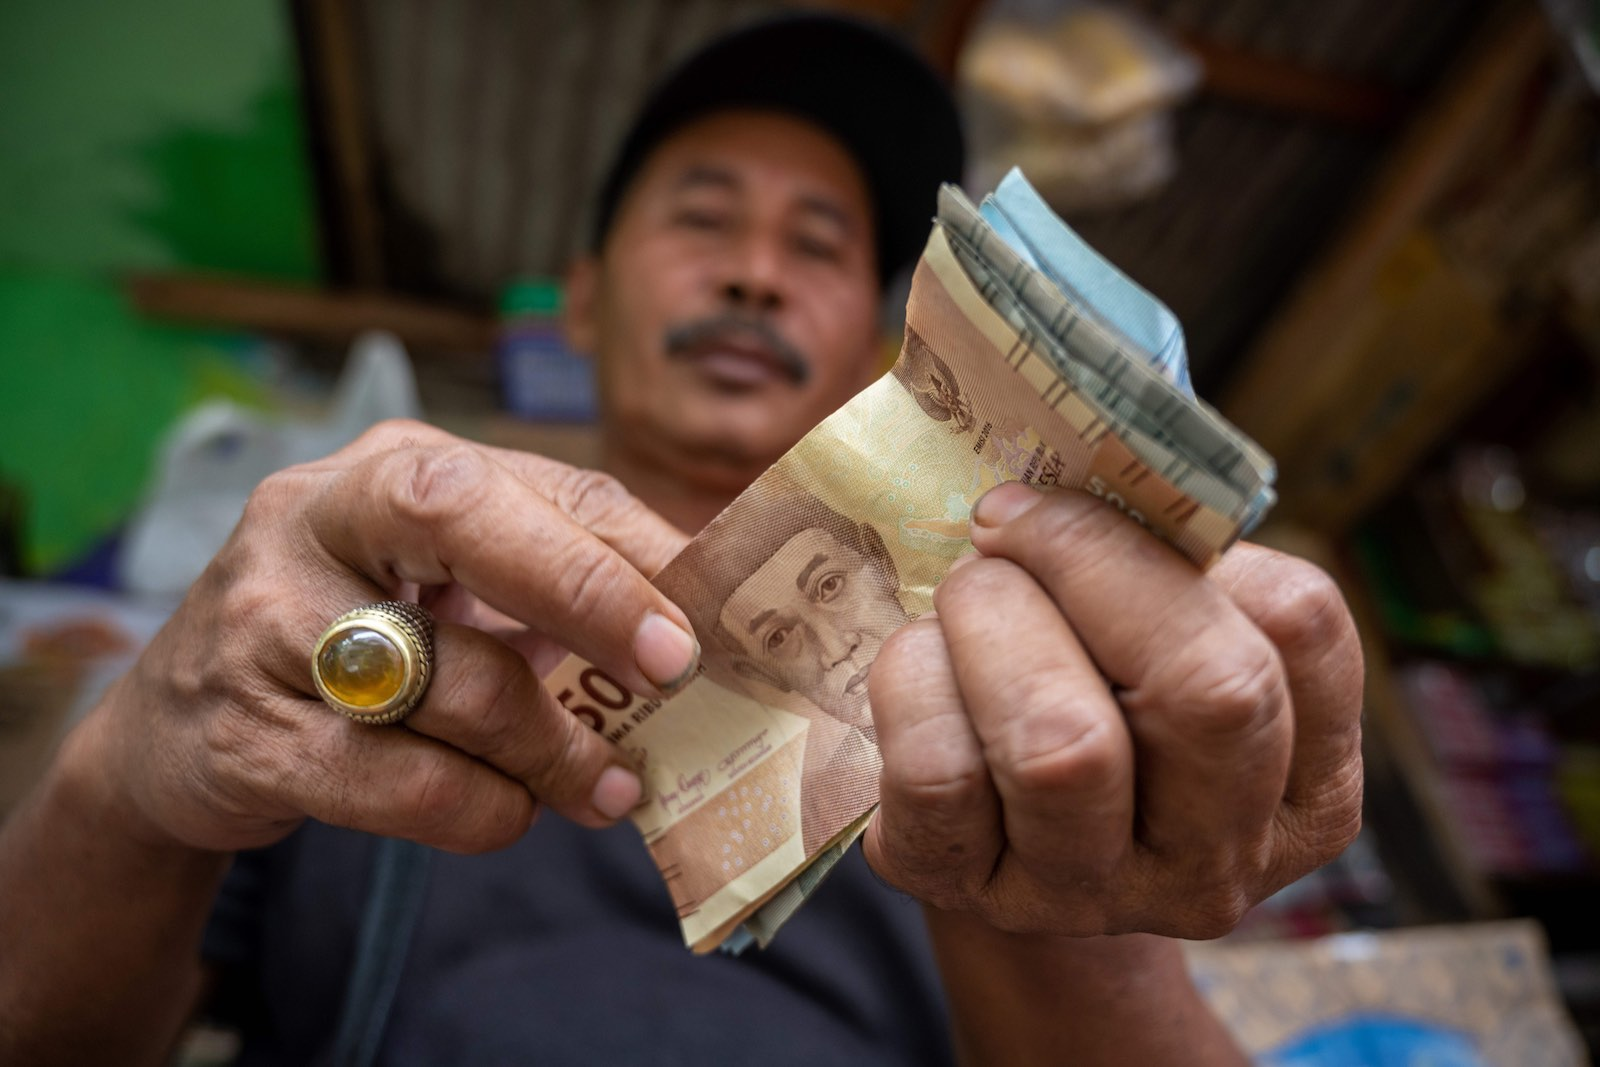 A Jakarta street vendor, February 2020 (Bay Ismoyo/AFP via Getty Images)